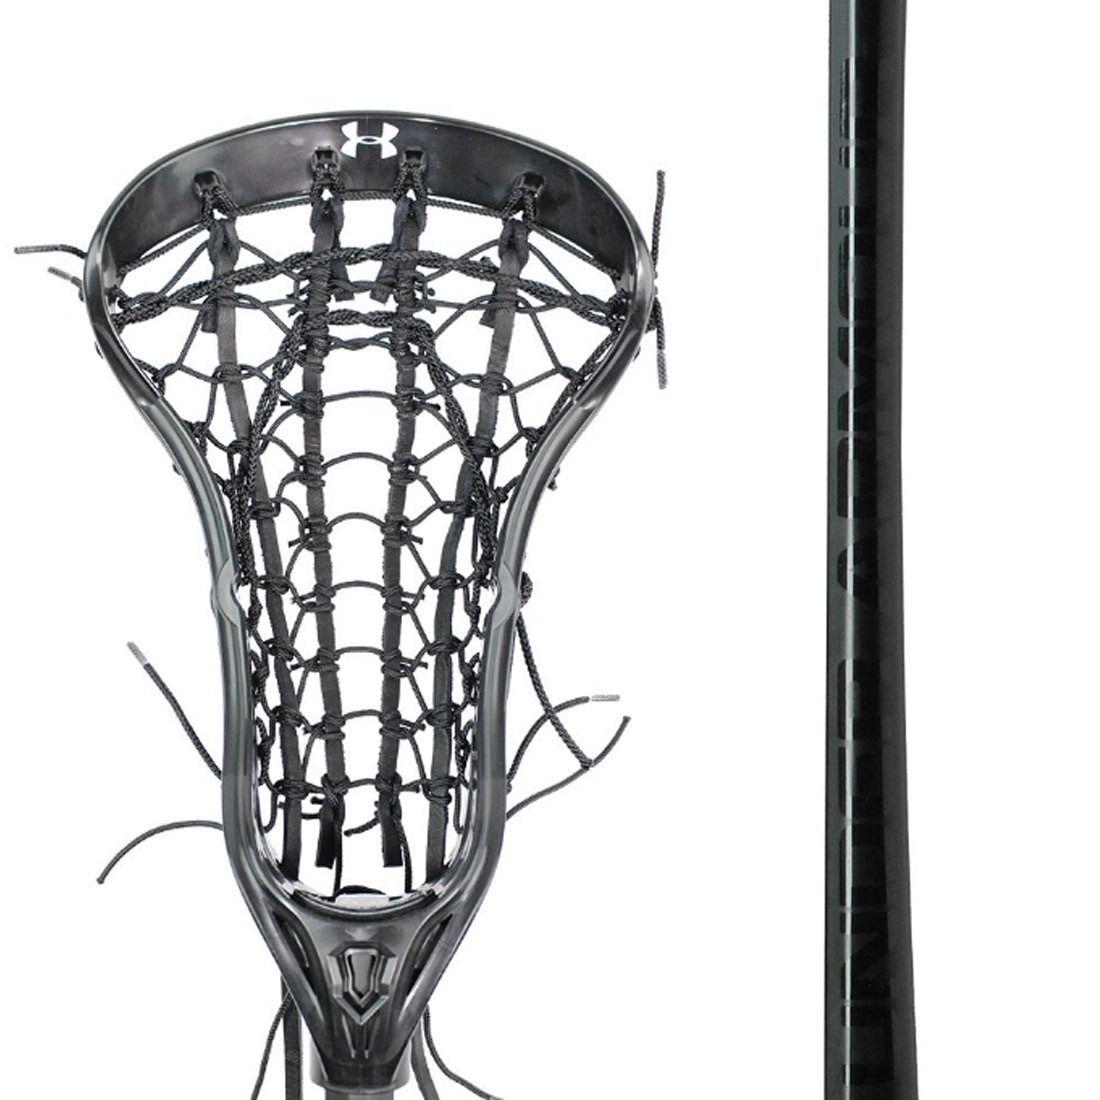 Under Armour Regime Complete Stick Attack Midfield Lacrosse Sticks Women Lacrosse